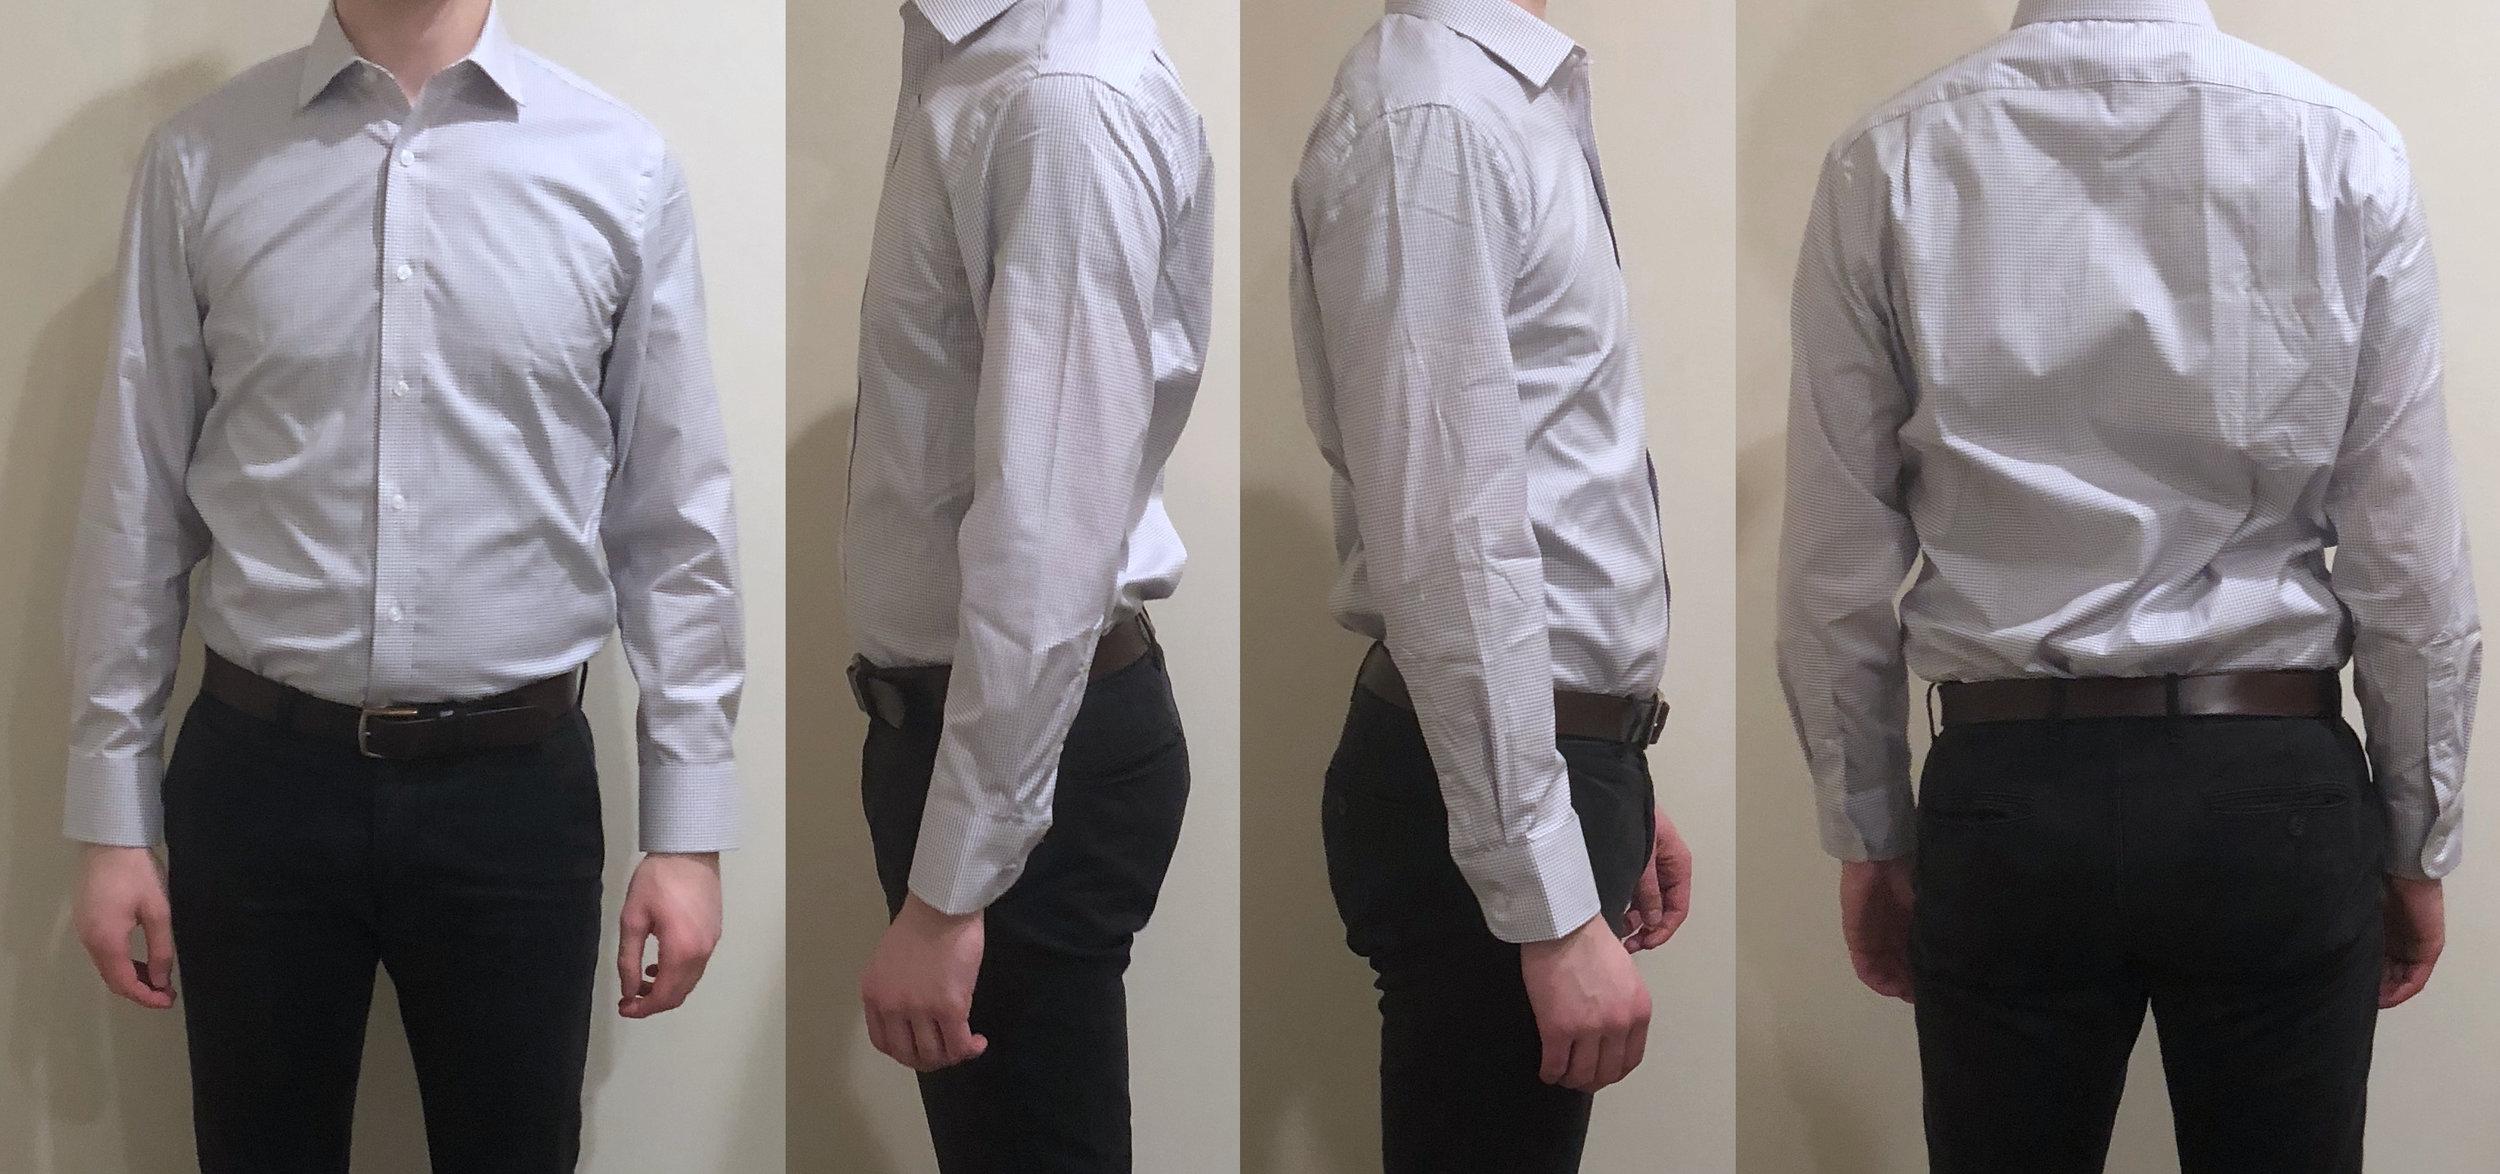 Size 15.5/33 fit pics